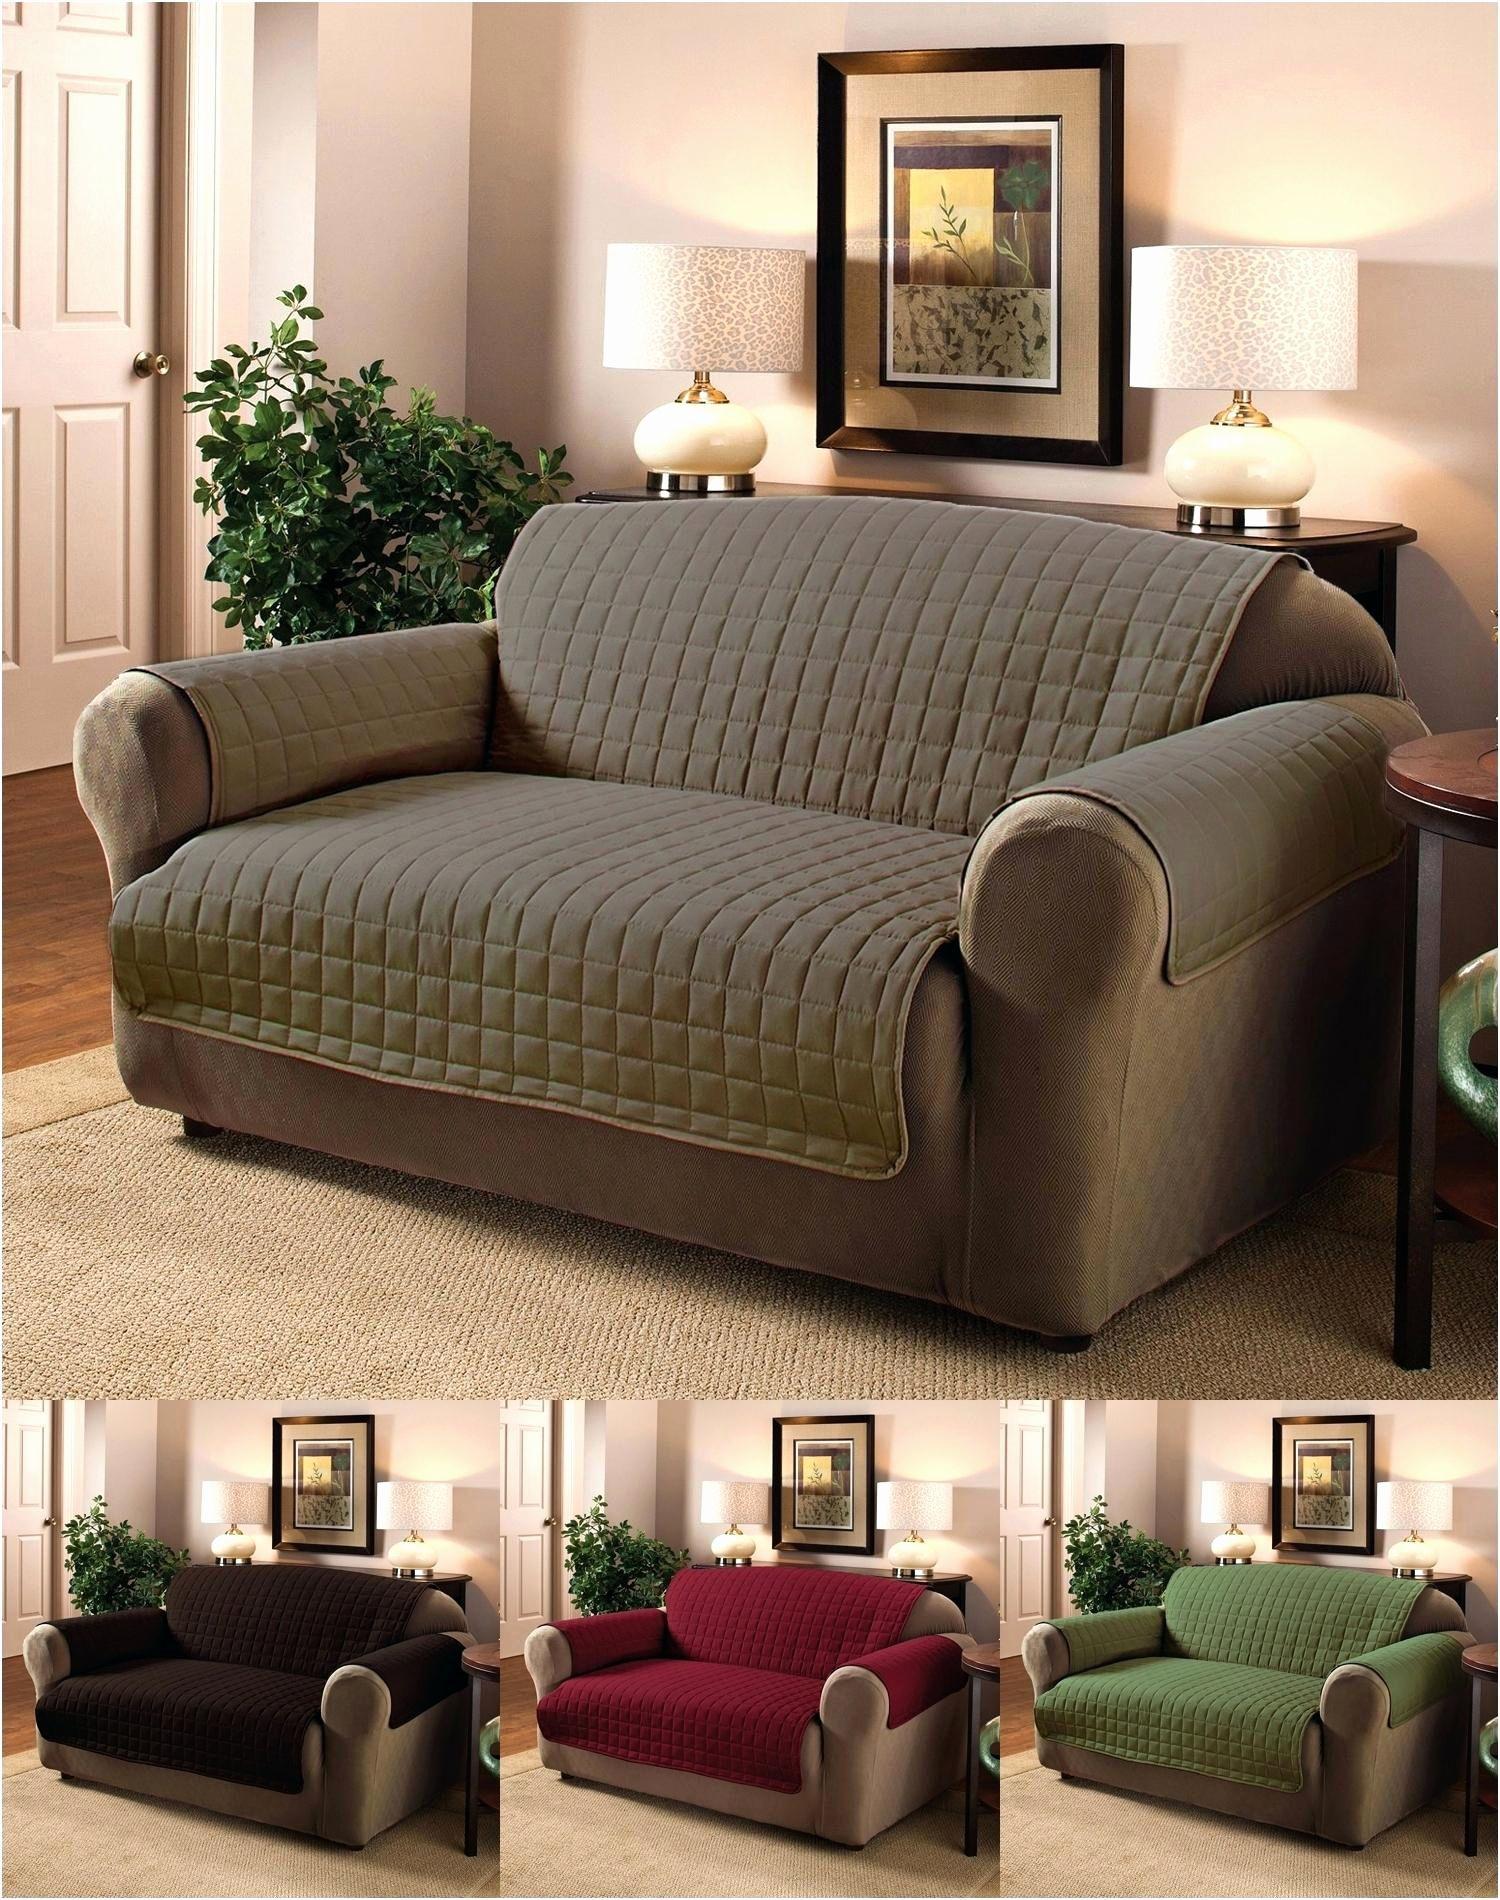 Luxury Sofa Covers Target Pics Sofa Covers Target Inspirational  ~ Leather Sofa Protectors